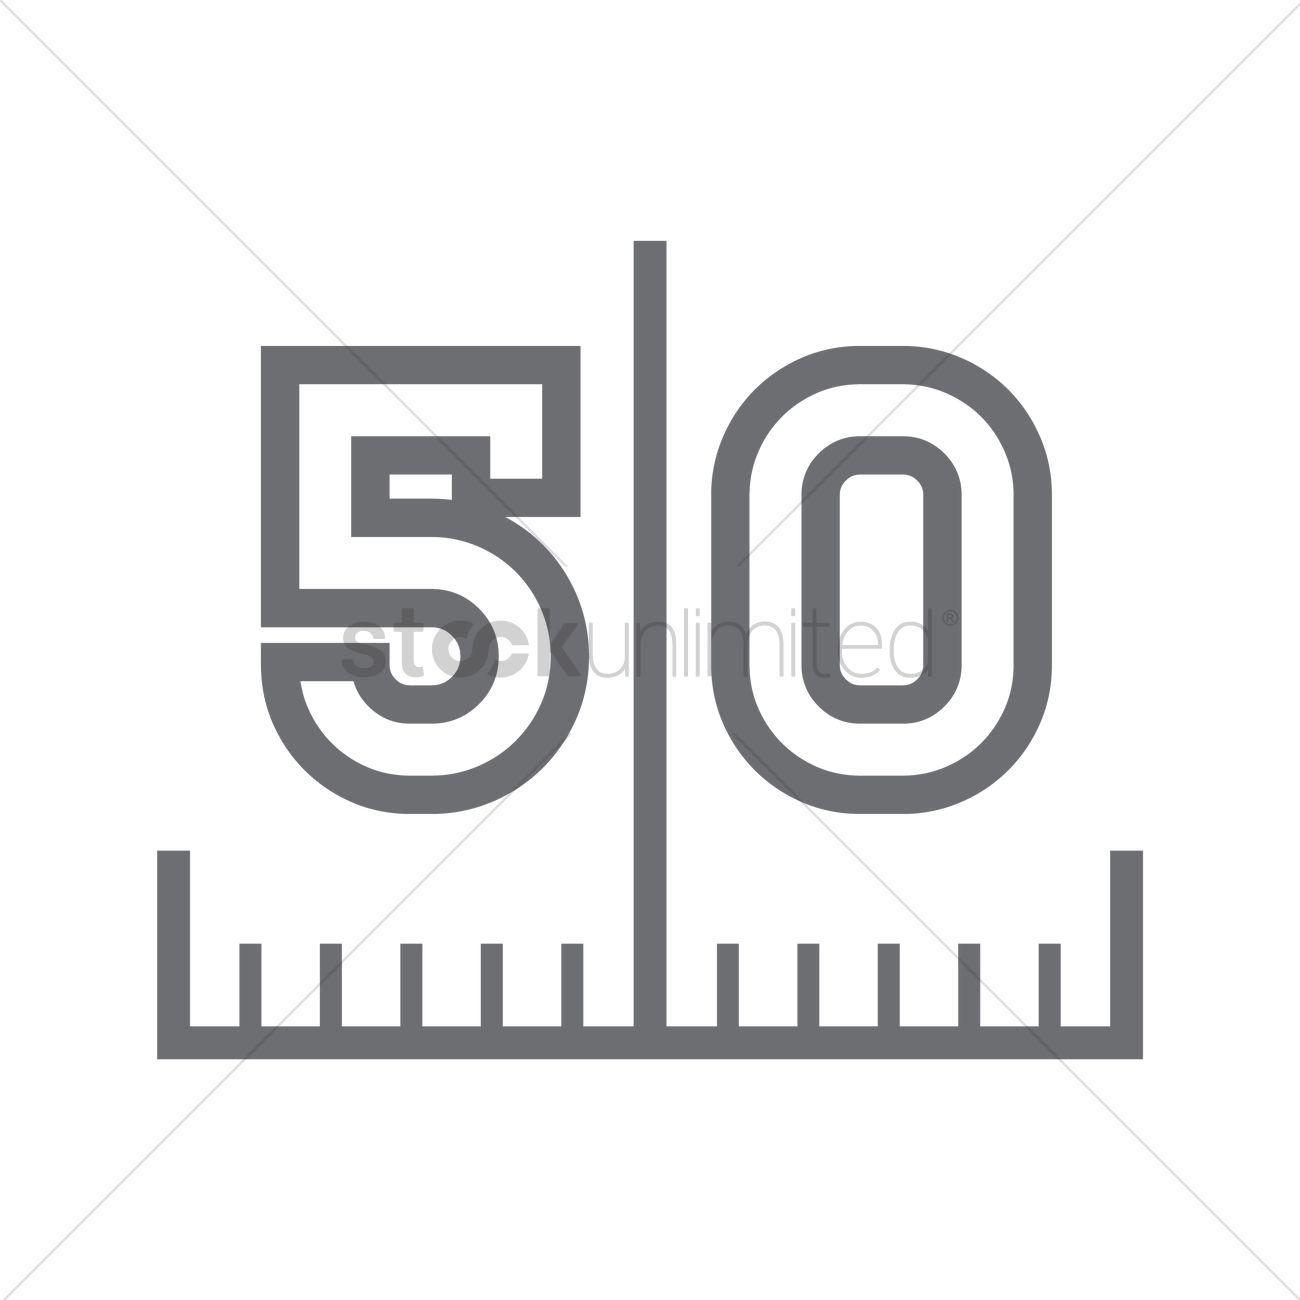 1300x1300 50 Yard Line On American Football Field Vector Image